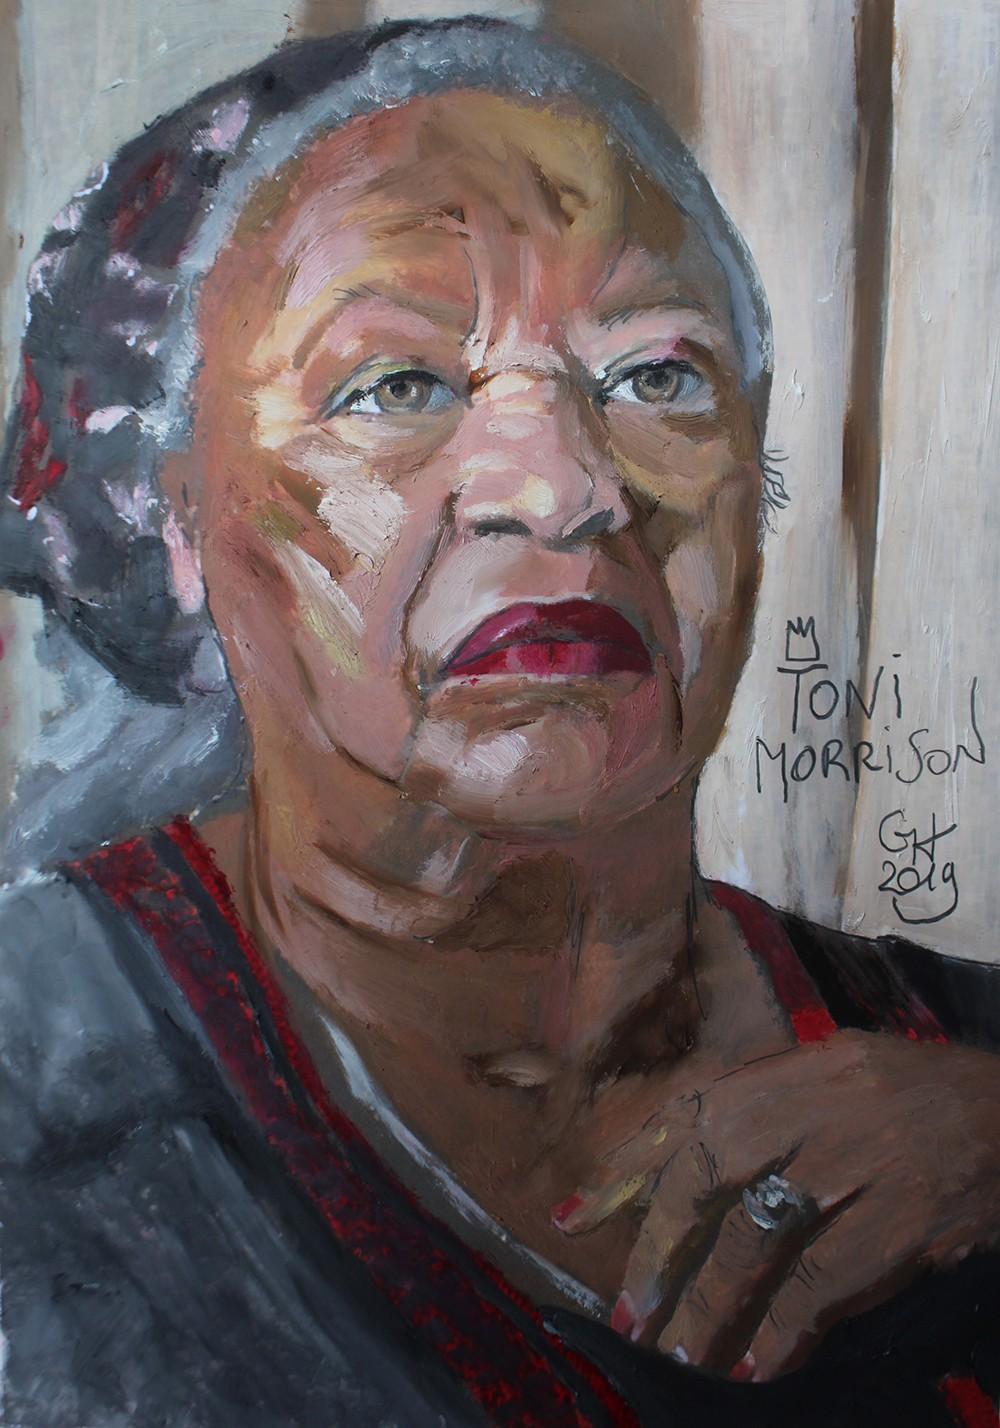 11. Toni Morrison - Grégory Huck